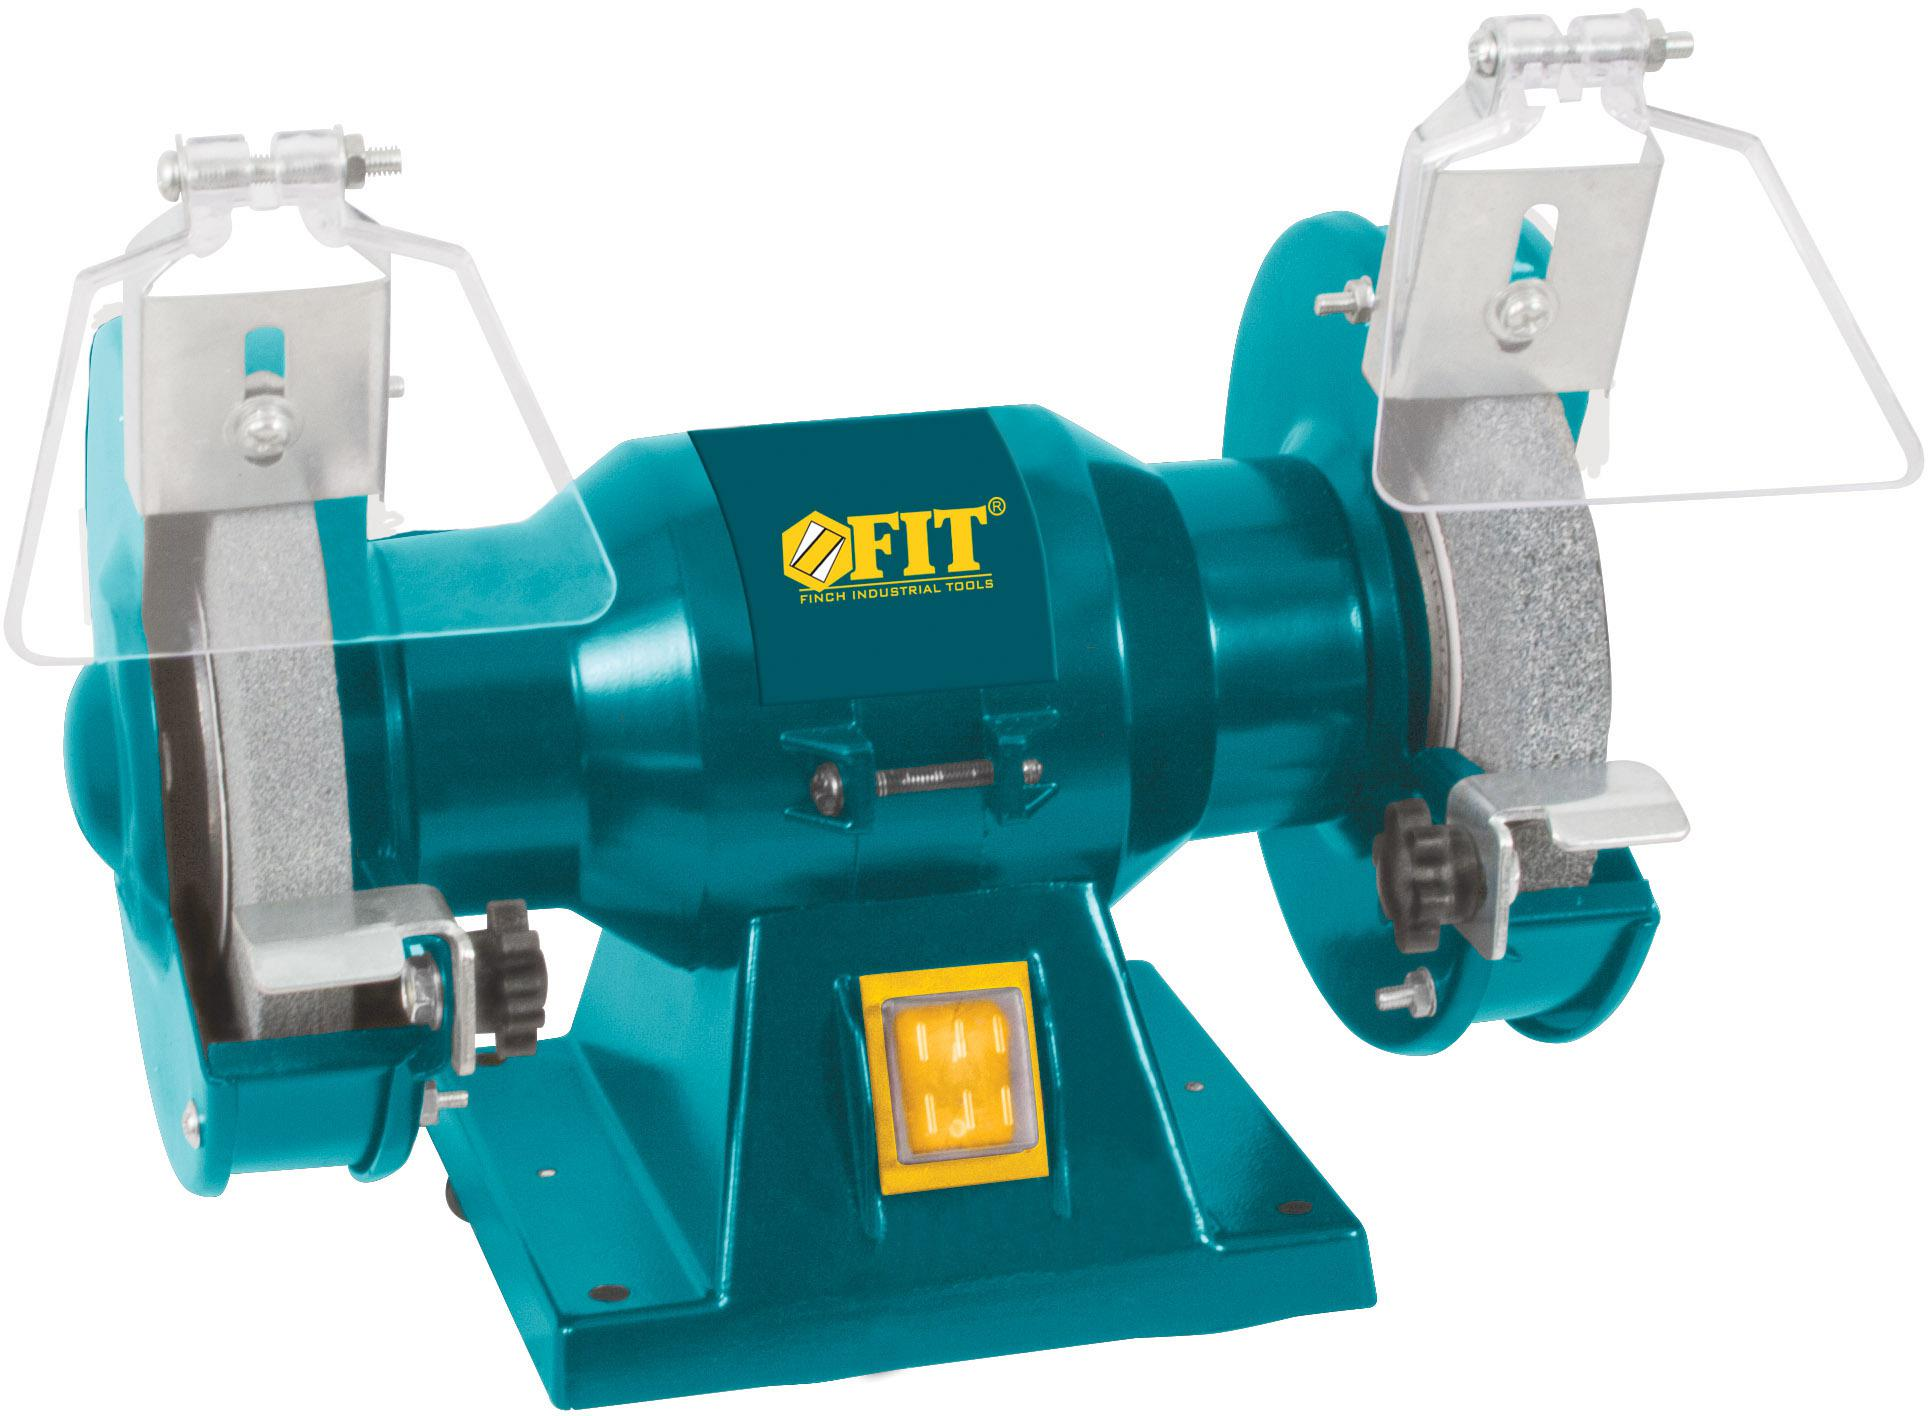 Точило Fit Bg-125/121